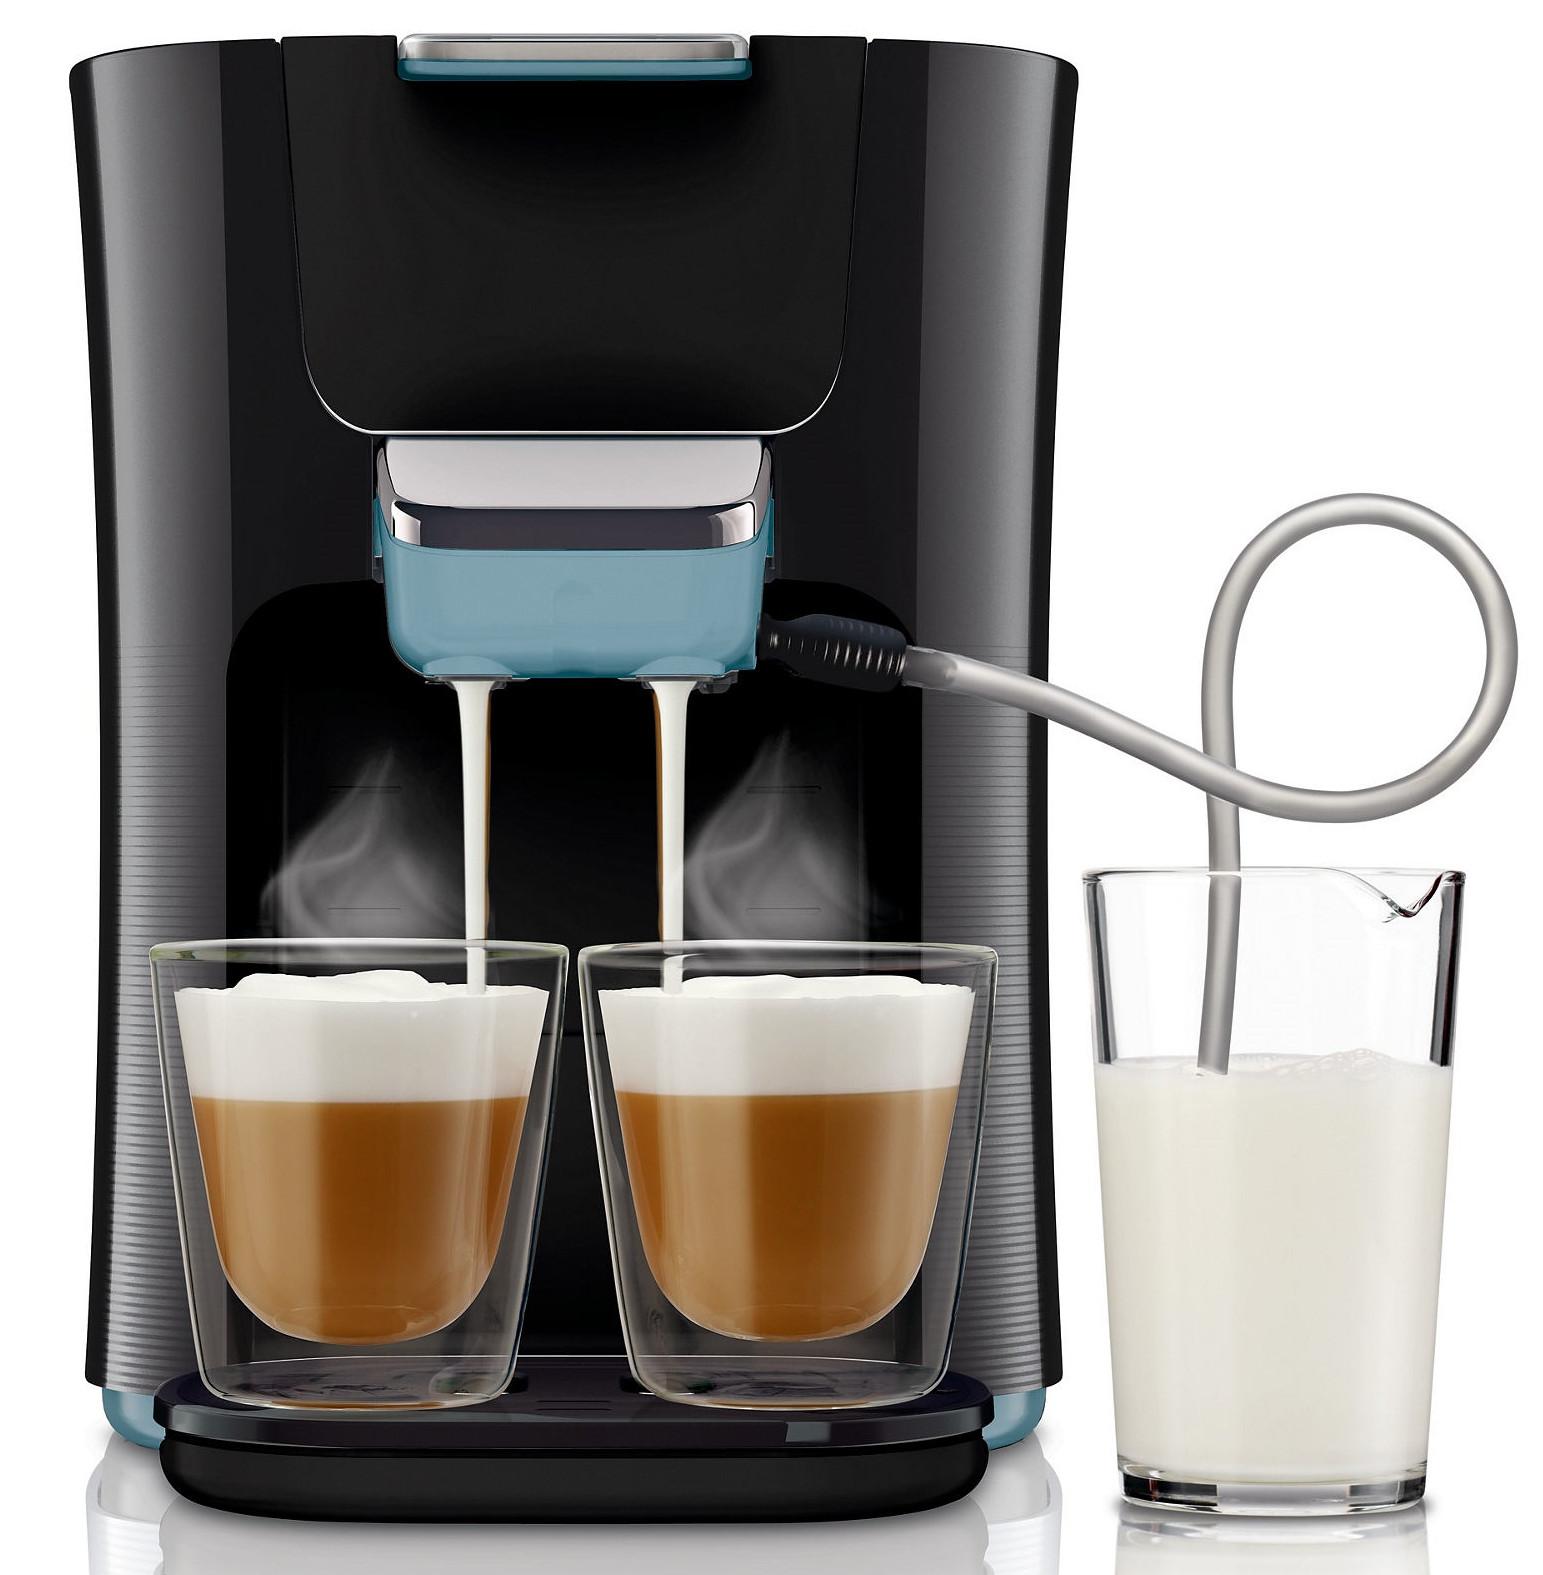 Senseo Latte Duo - de lekkerste cappuccino en latte macchiato!